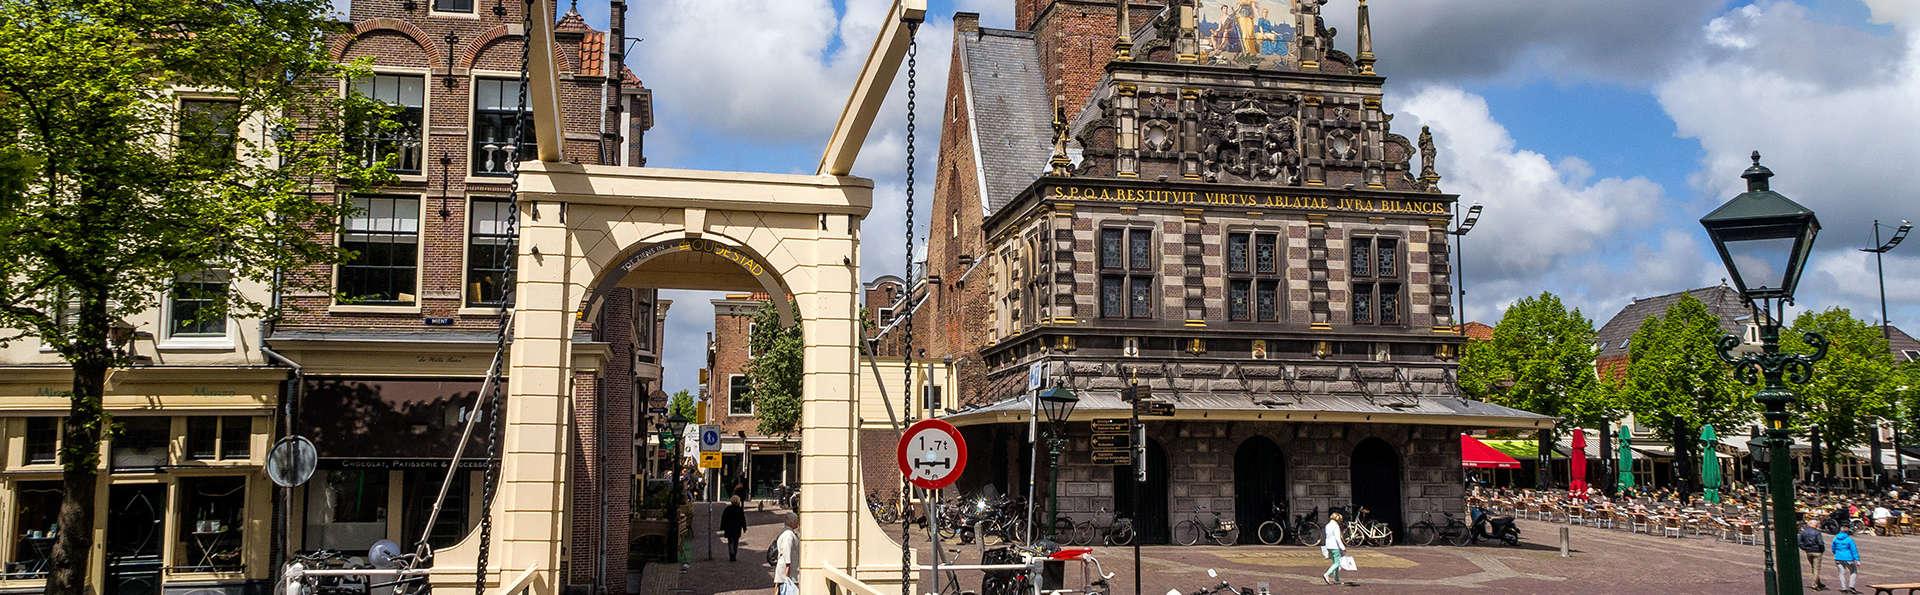 Fletcher Hotel-Restaurant Heiloo - Edit_Alkmaar2.jpg